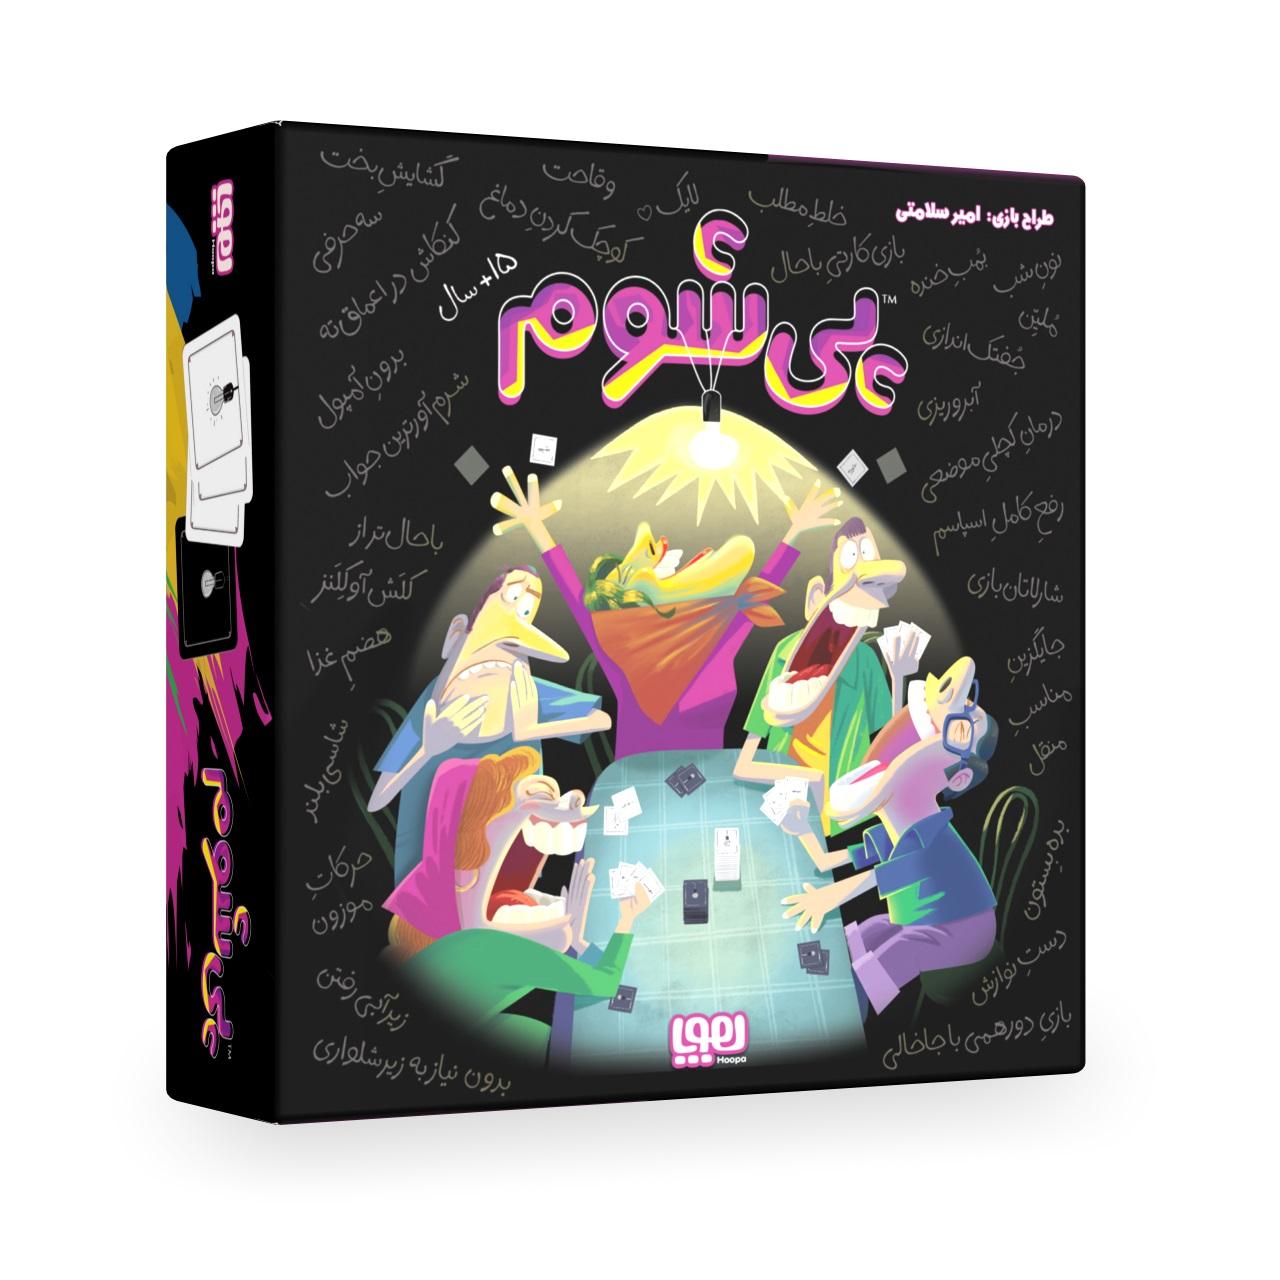 پي-شوم-(هوپا)-جعبه-اي